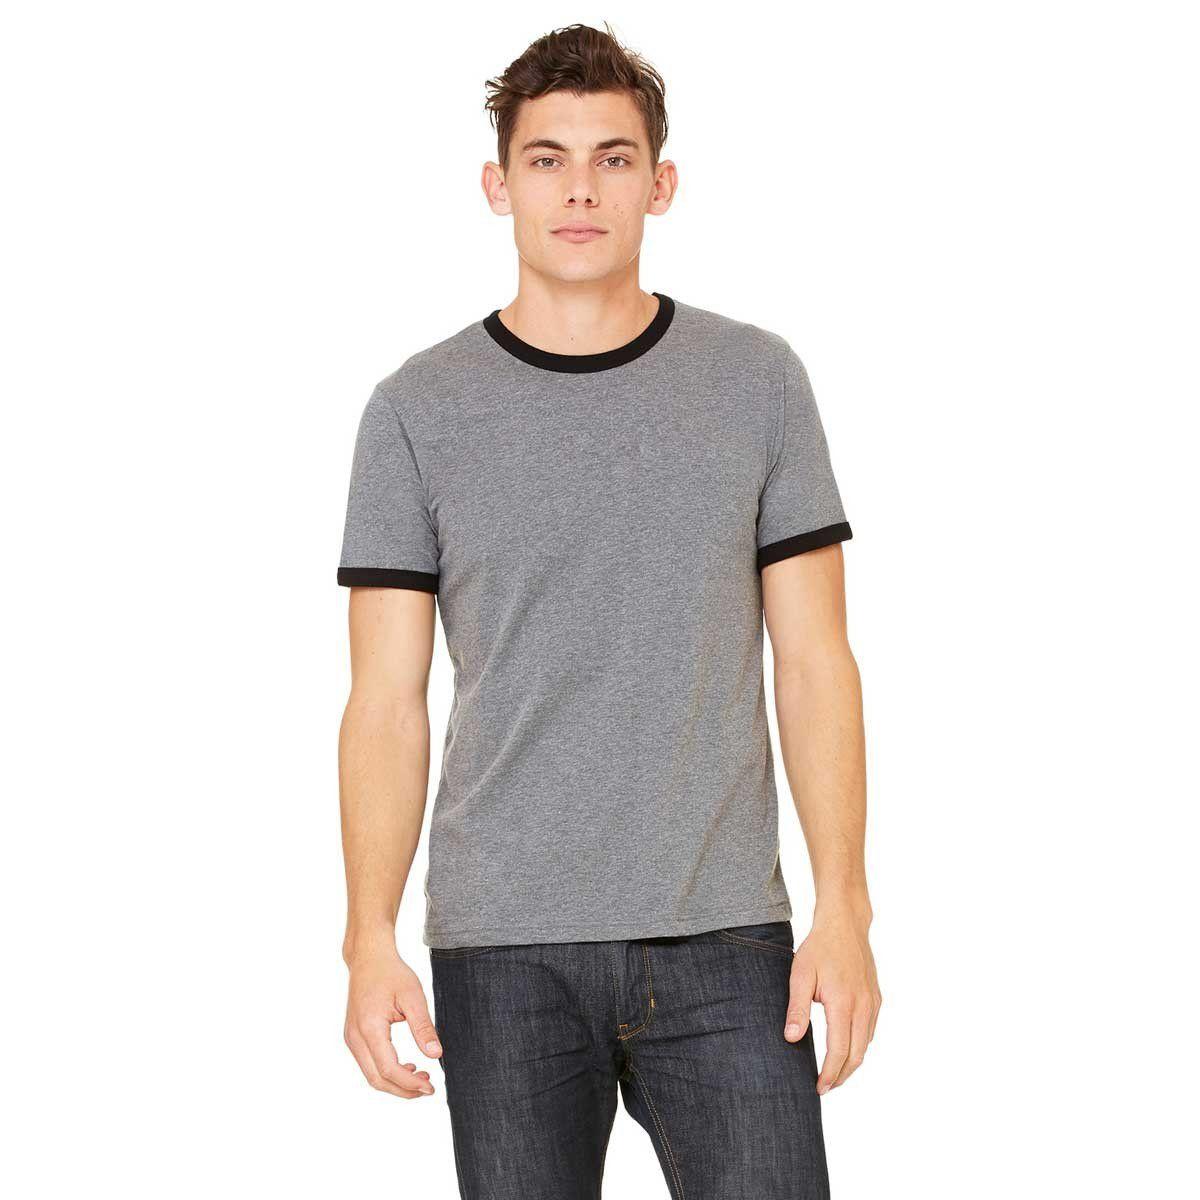 Bella Canvas-Heather Ringer Jersey T-Shirt